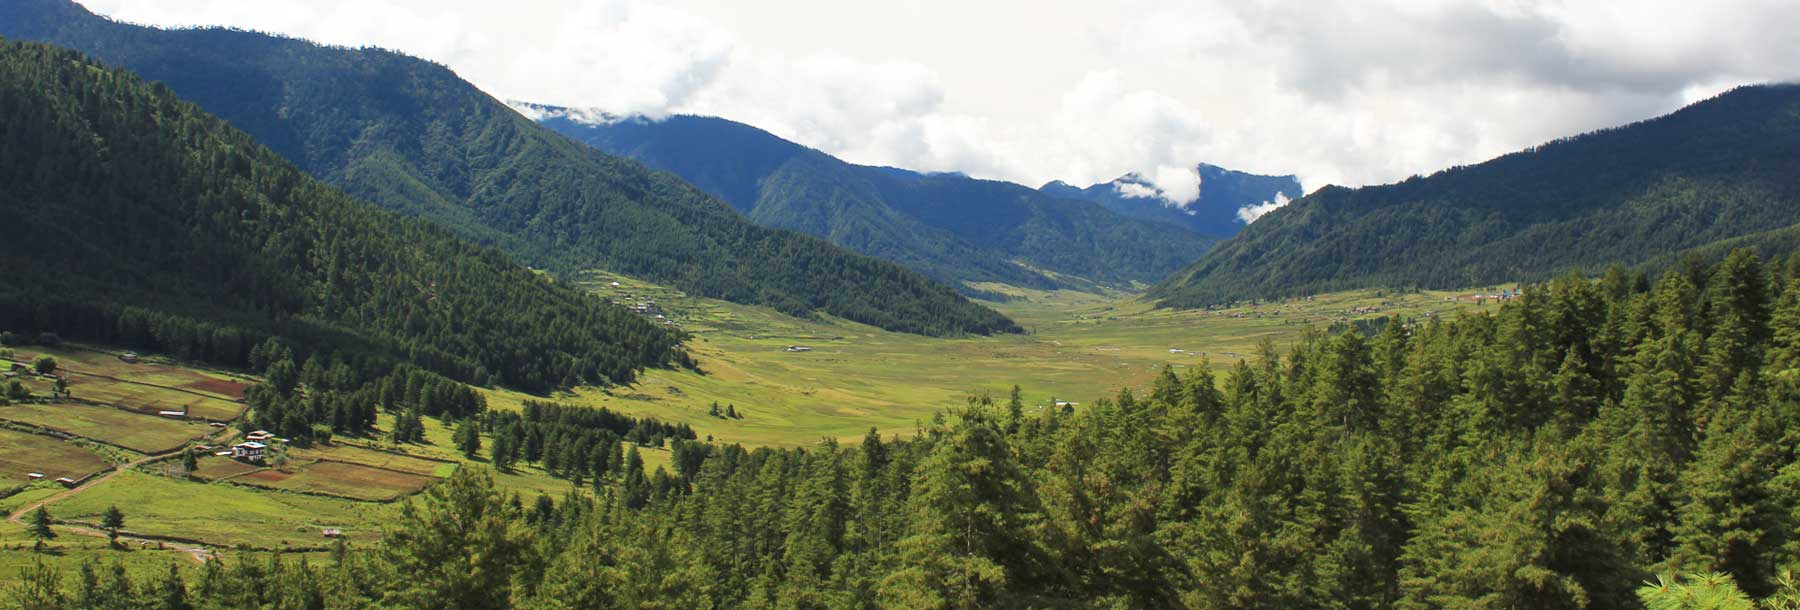 The glacial valley of Phobjikha, Central Bhutan.